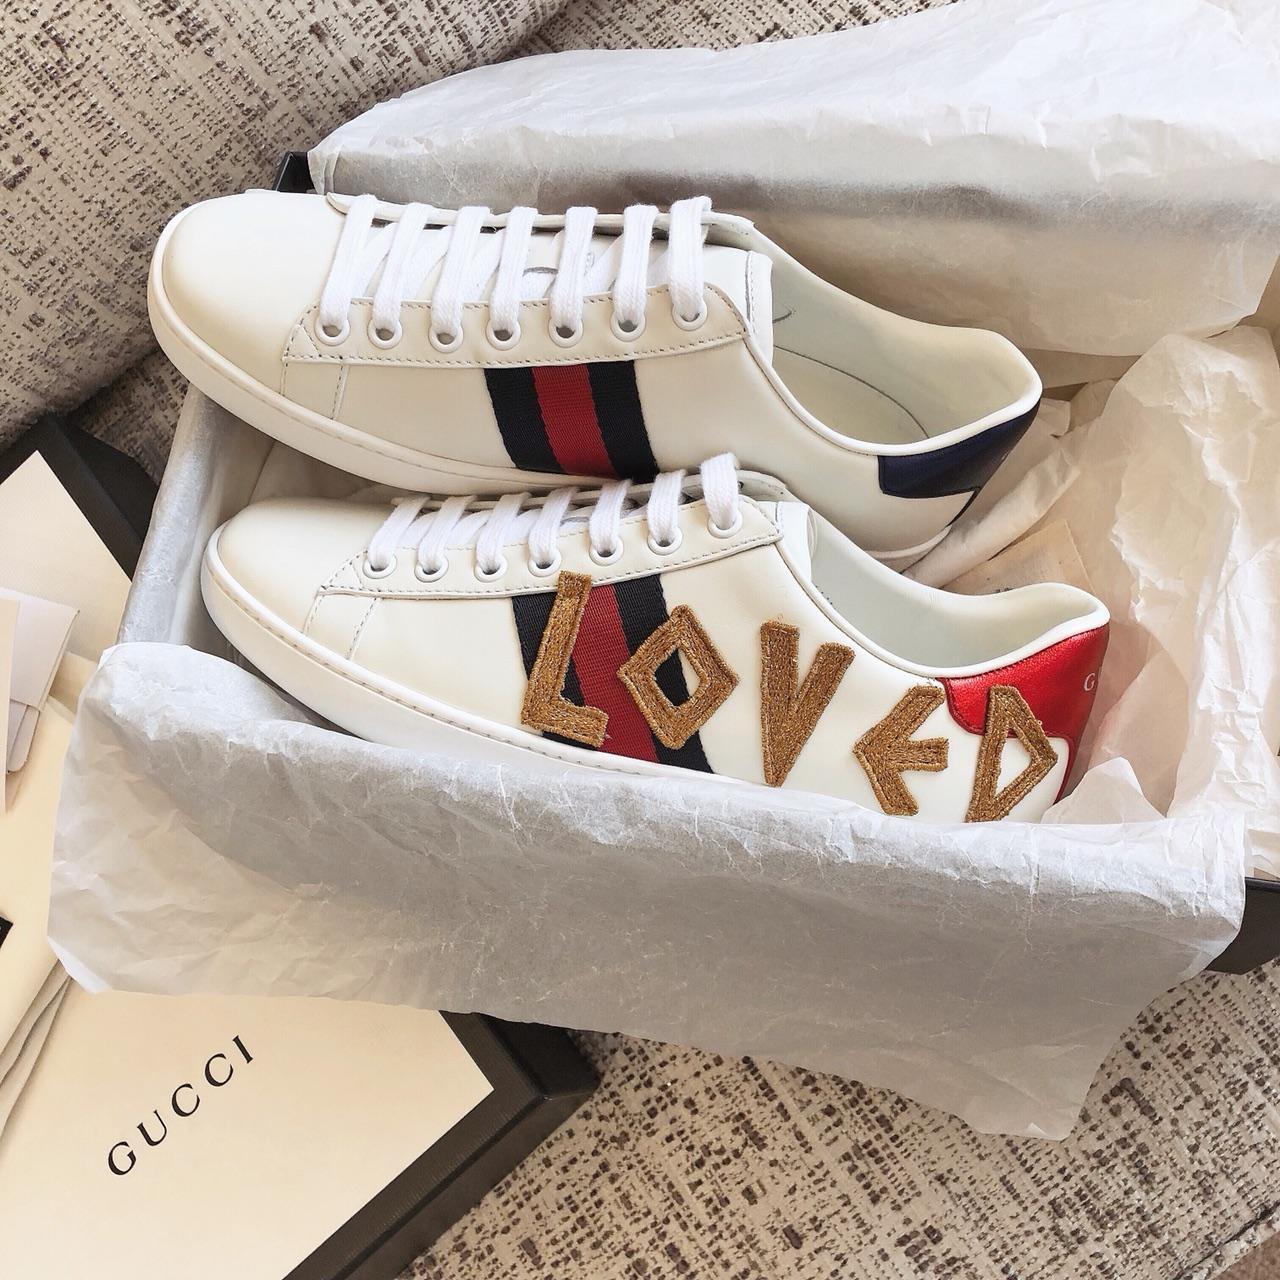 GUCCI小白鞋贸易公司出品 支持专柜验货!